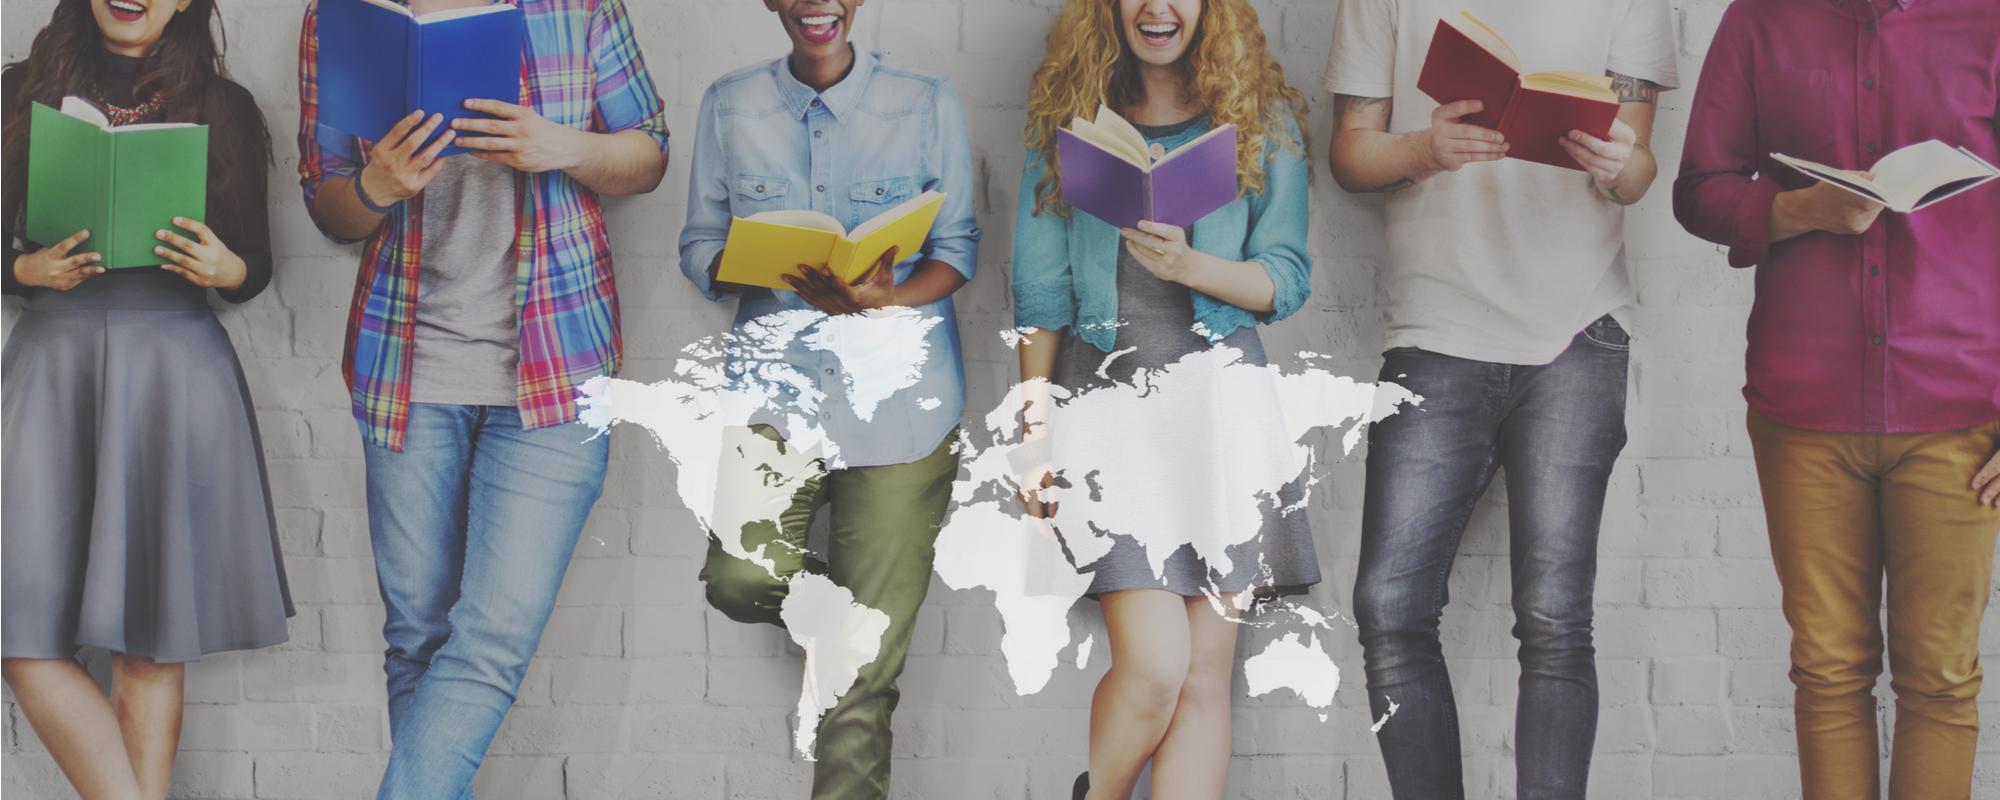 Fountainhead Montessori Adult Education   International Students